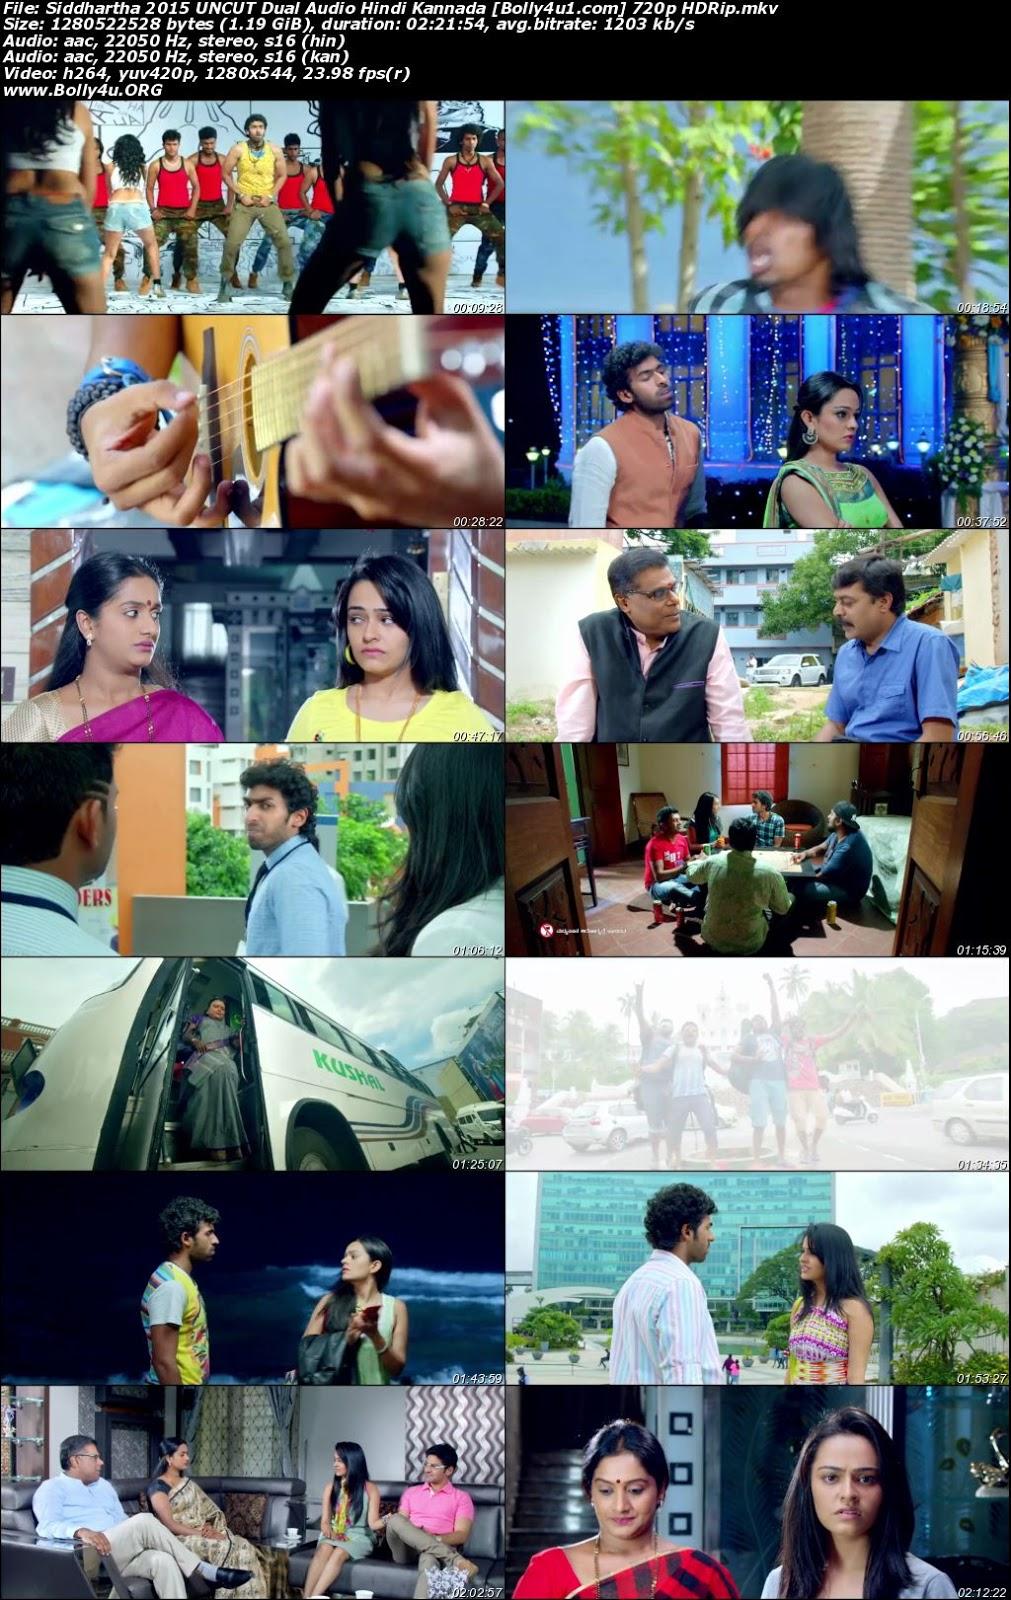 Siddhartha 2015 HDRip 450MB UNCUT Hindi Dubbed 480p Download